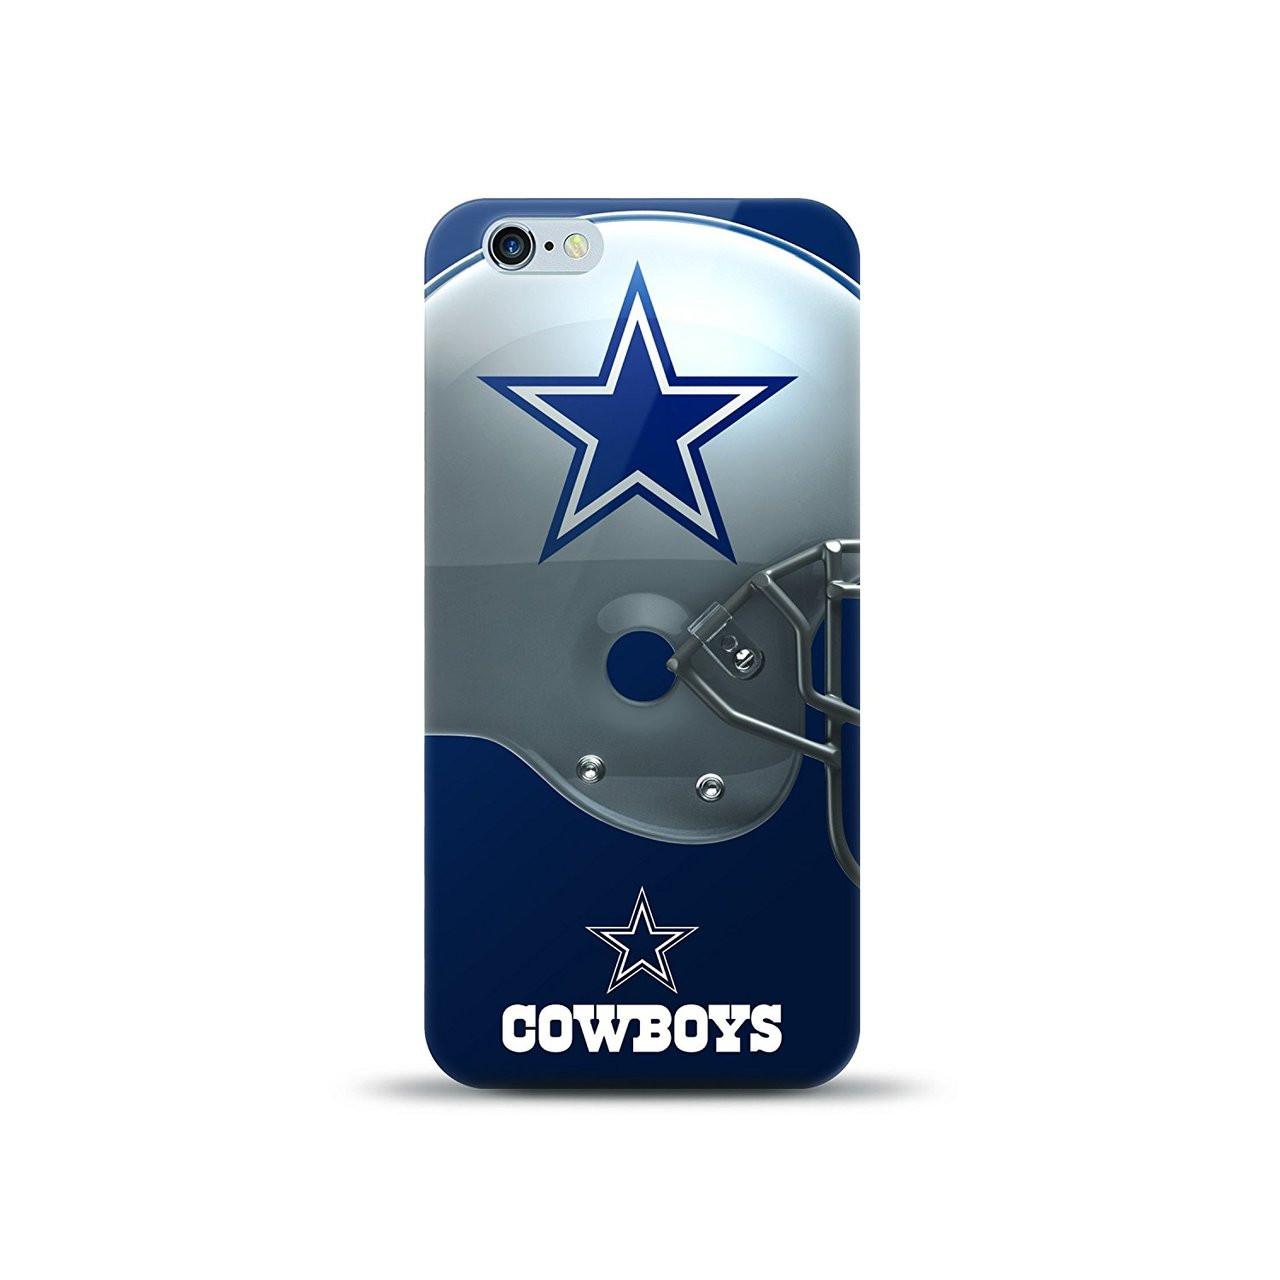 quality design 2fb3c 24bd2 NFL Dallas Cowboys iPhone 7+ Plus Helmet Series TPU Gel Case